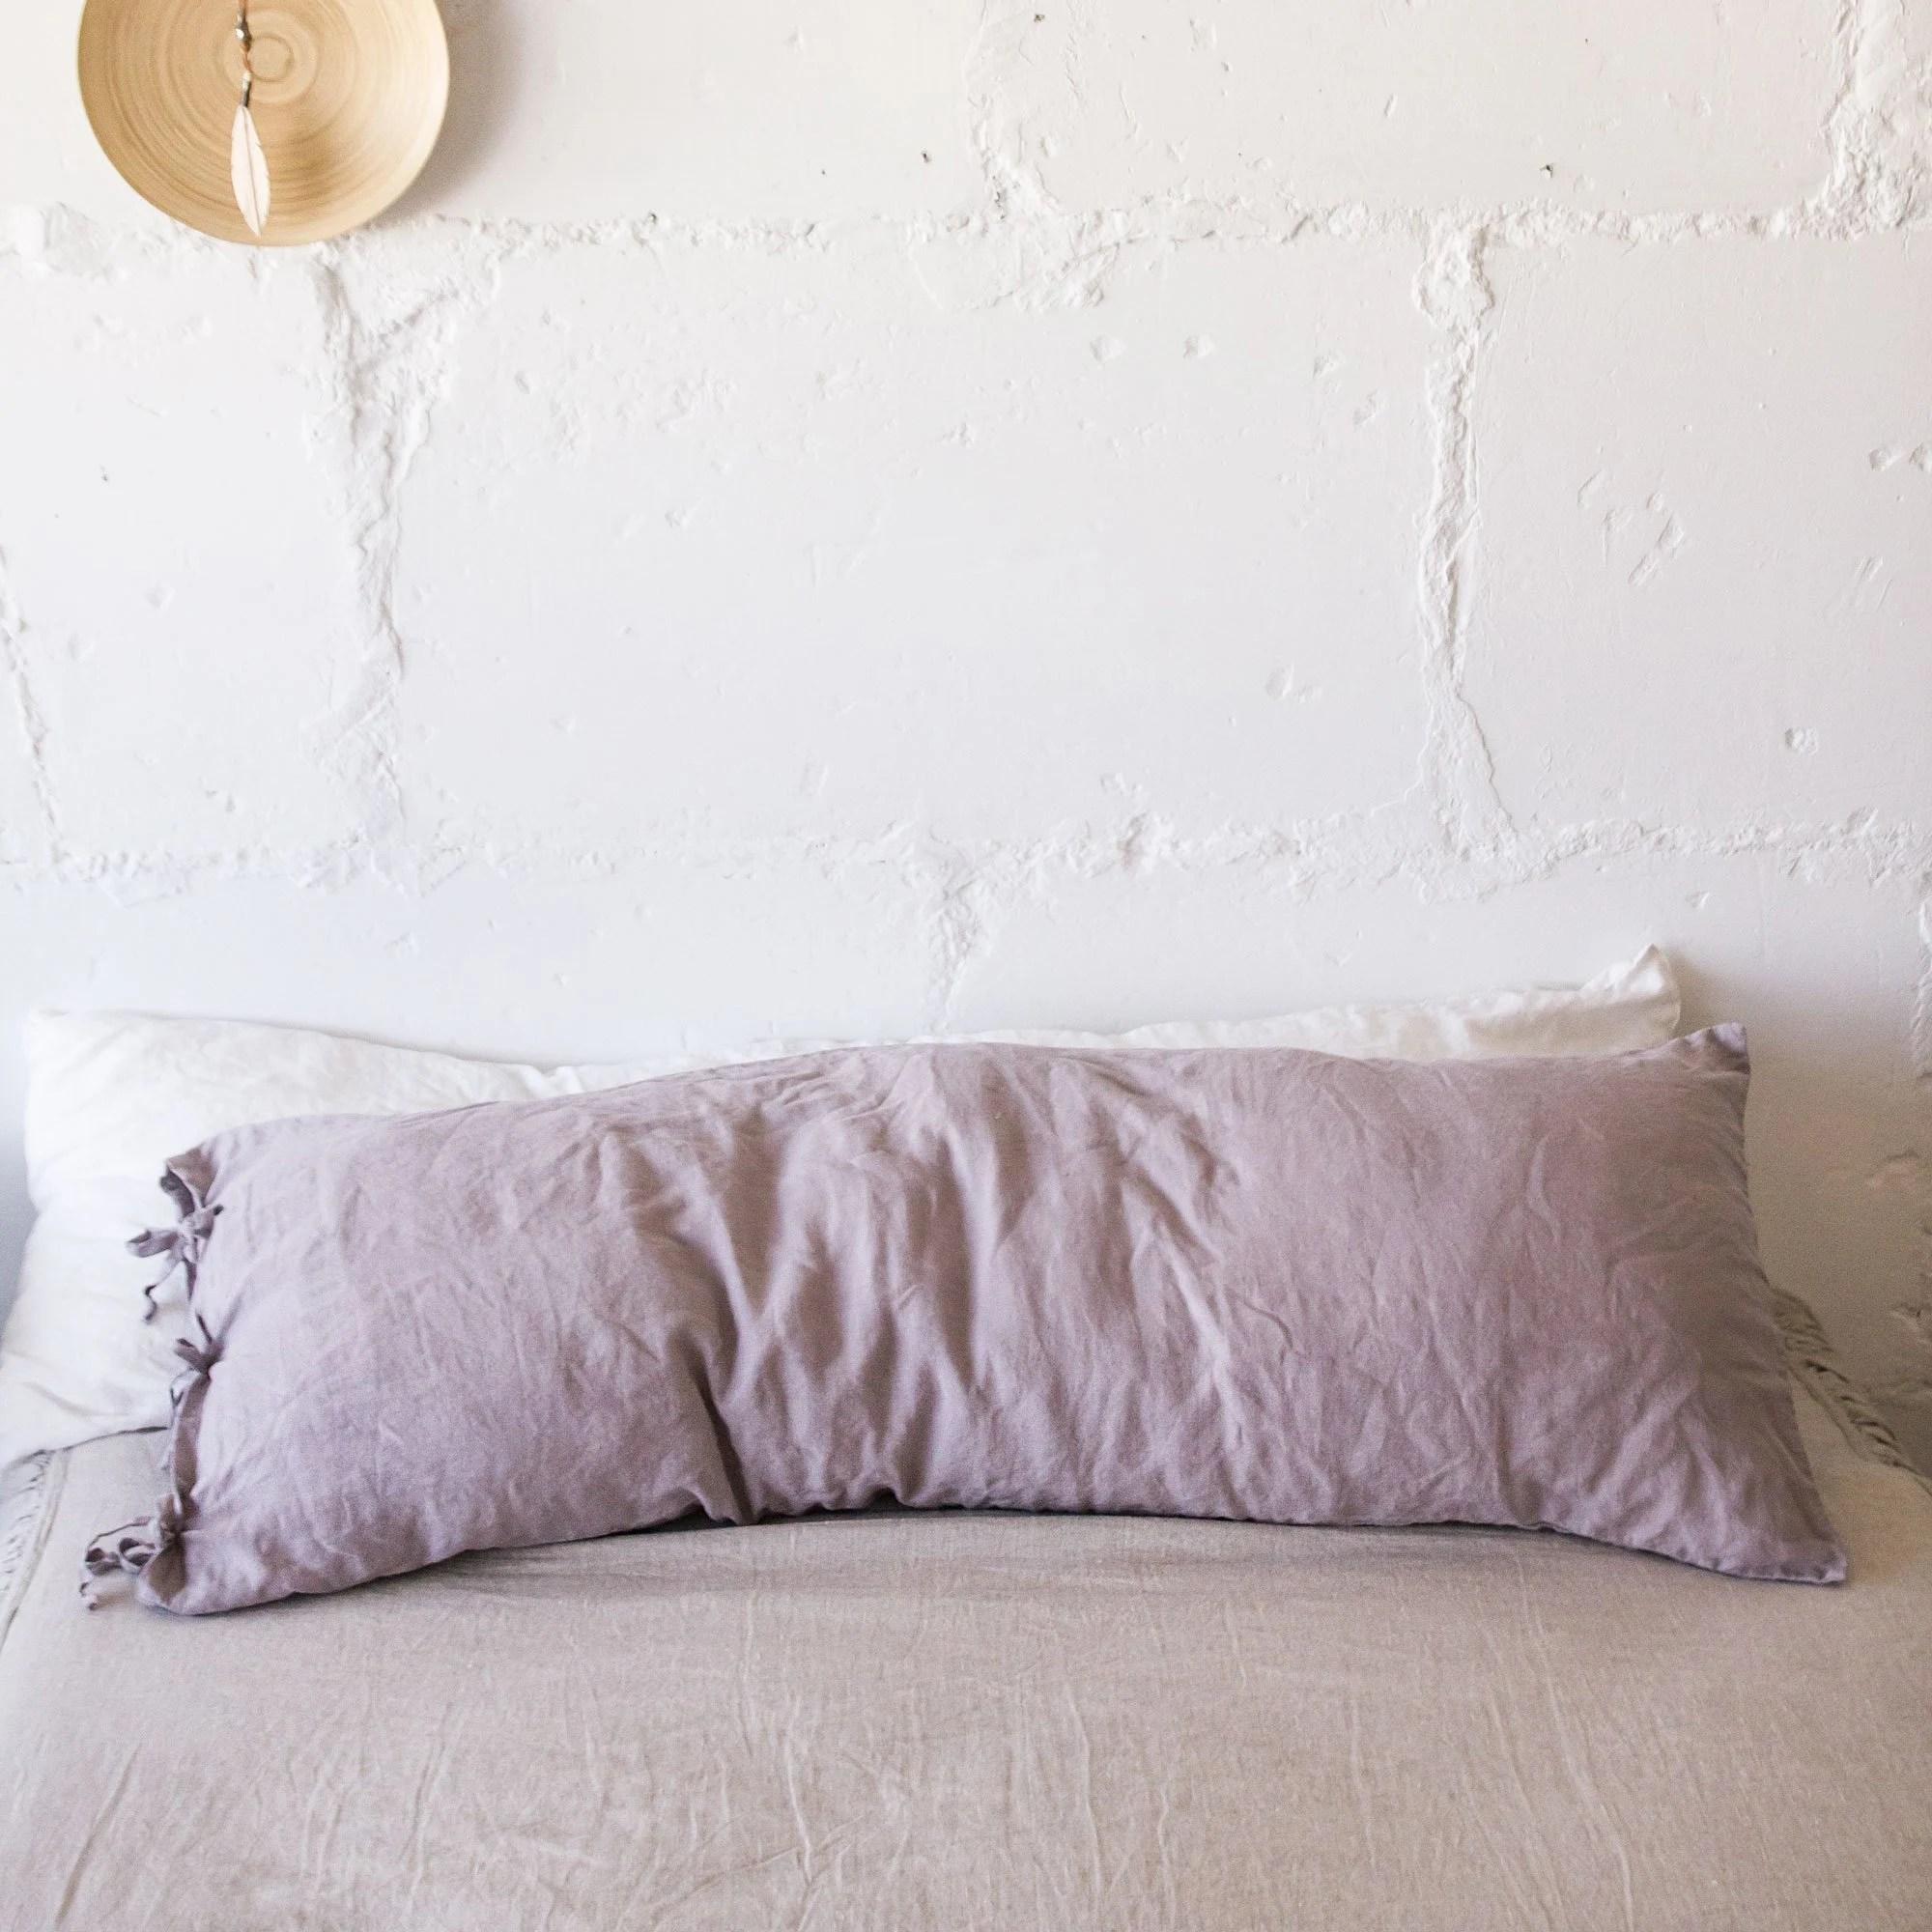 body pillowcase etsy